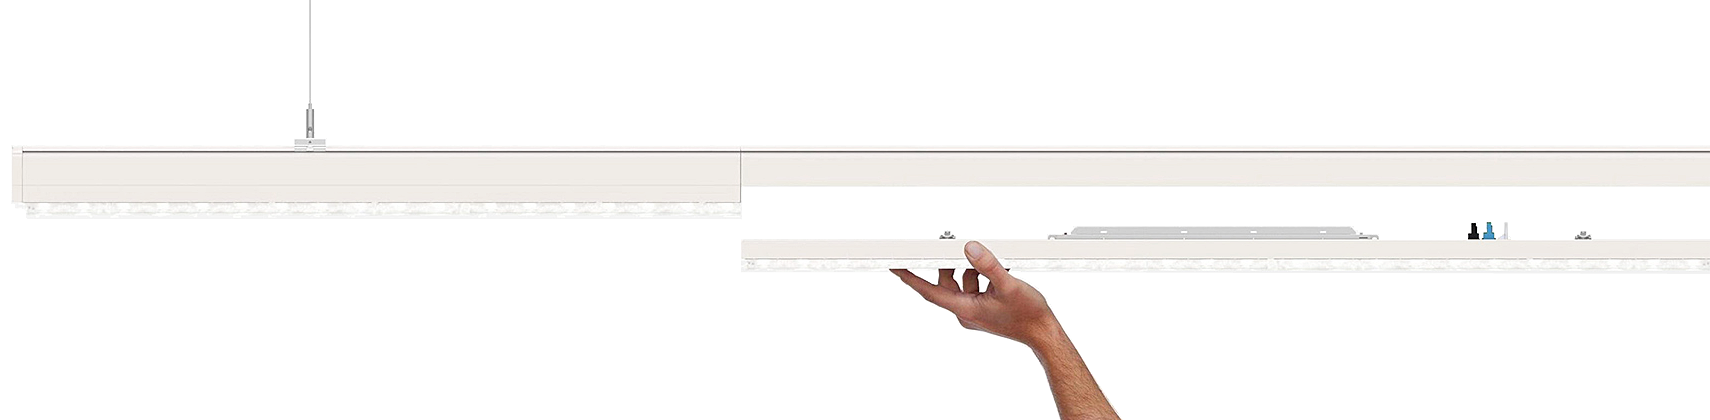 LED-Lichtband-Komplettsystem LSL-06-73